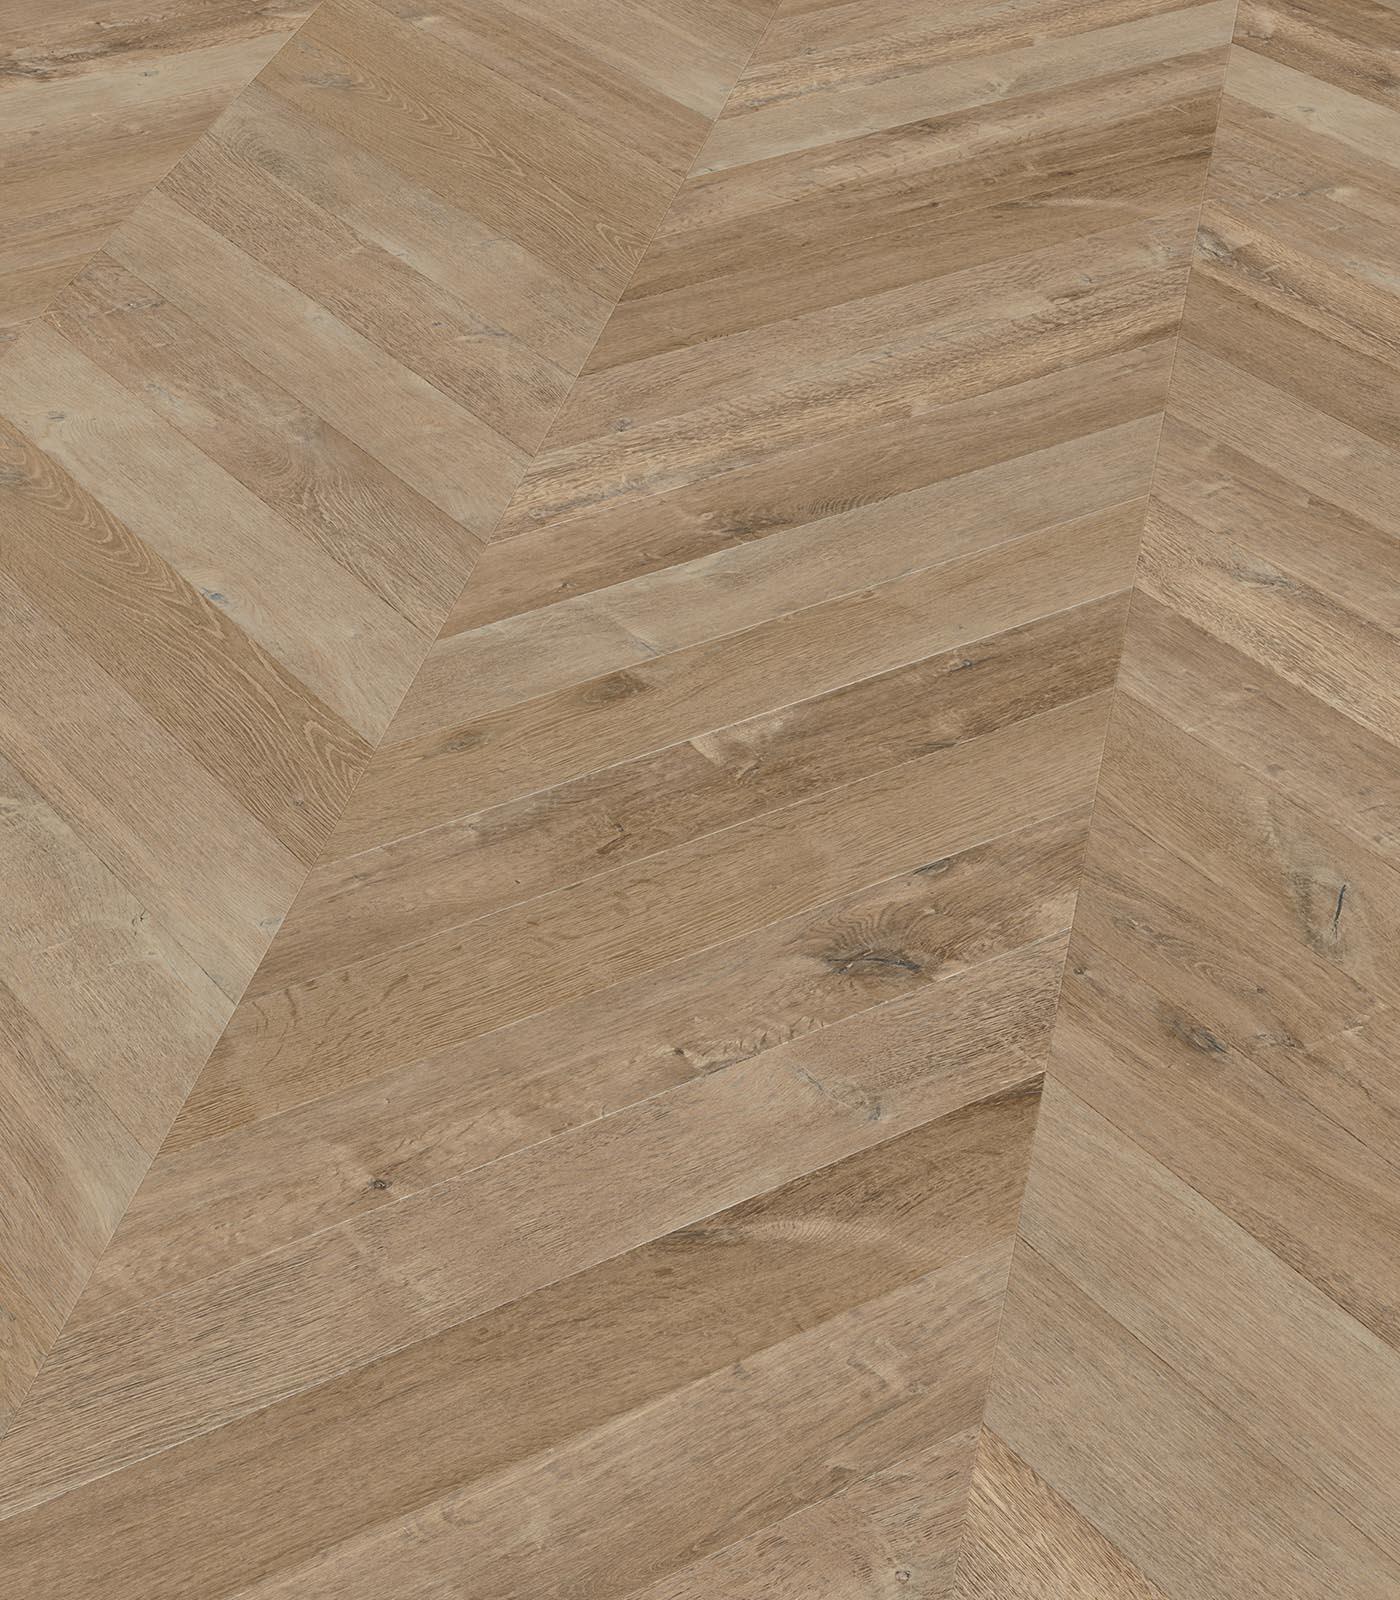 Bora Bora-Fashion Collection-Chevron European Oak floors-angle